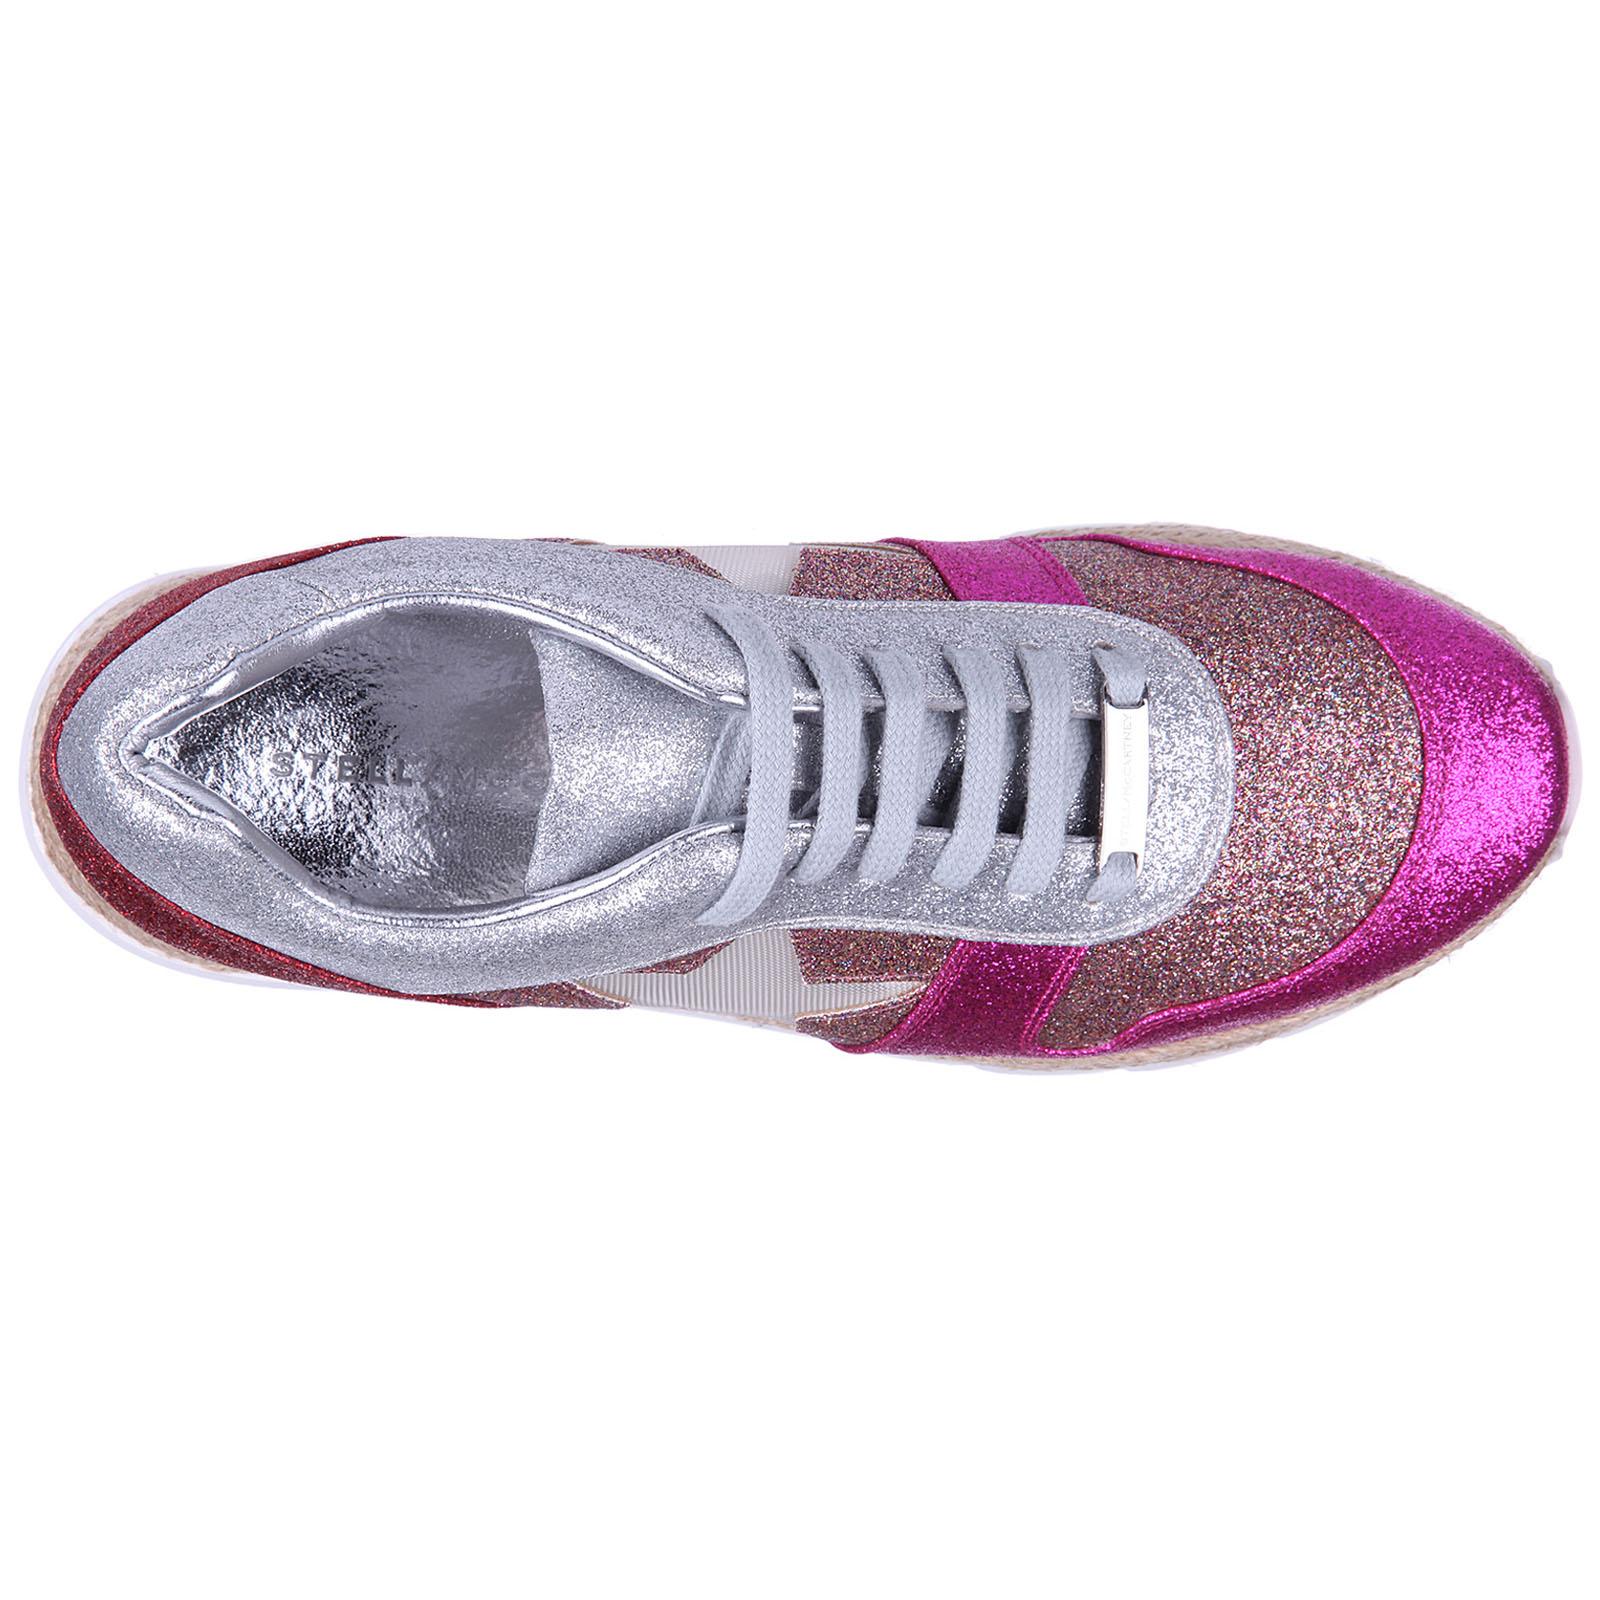 Chaussures baskets sneakers femme orignale isley